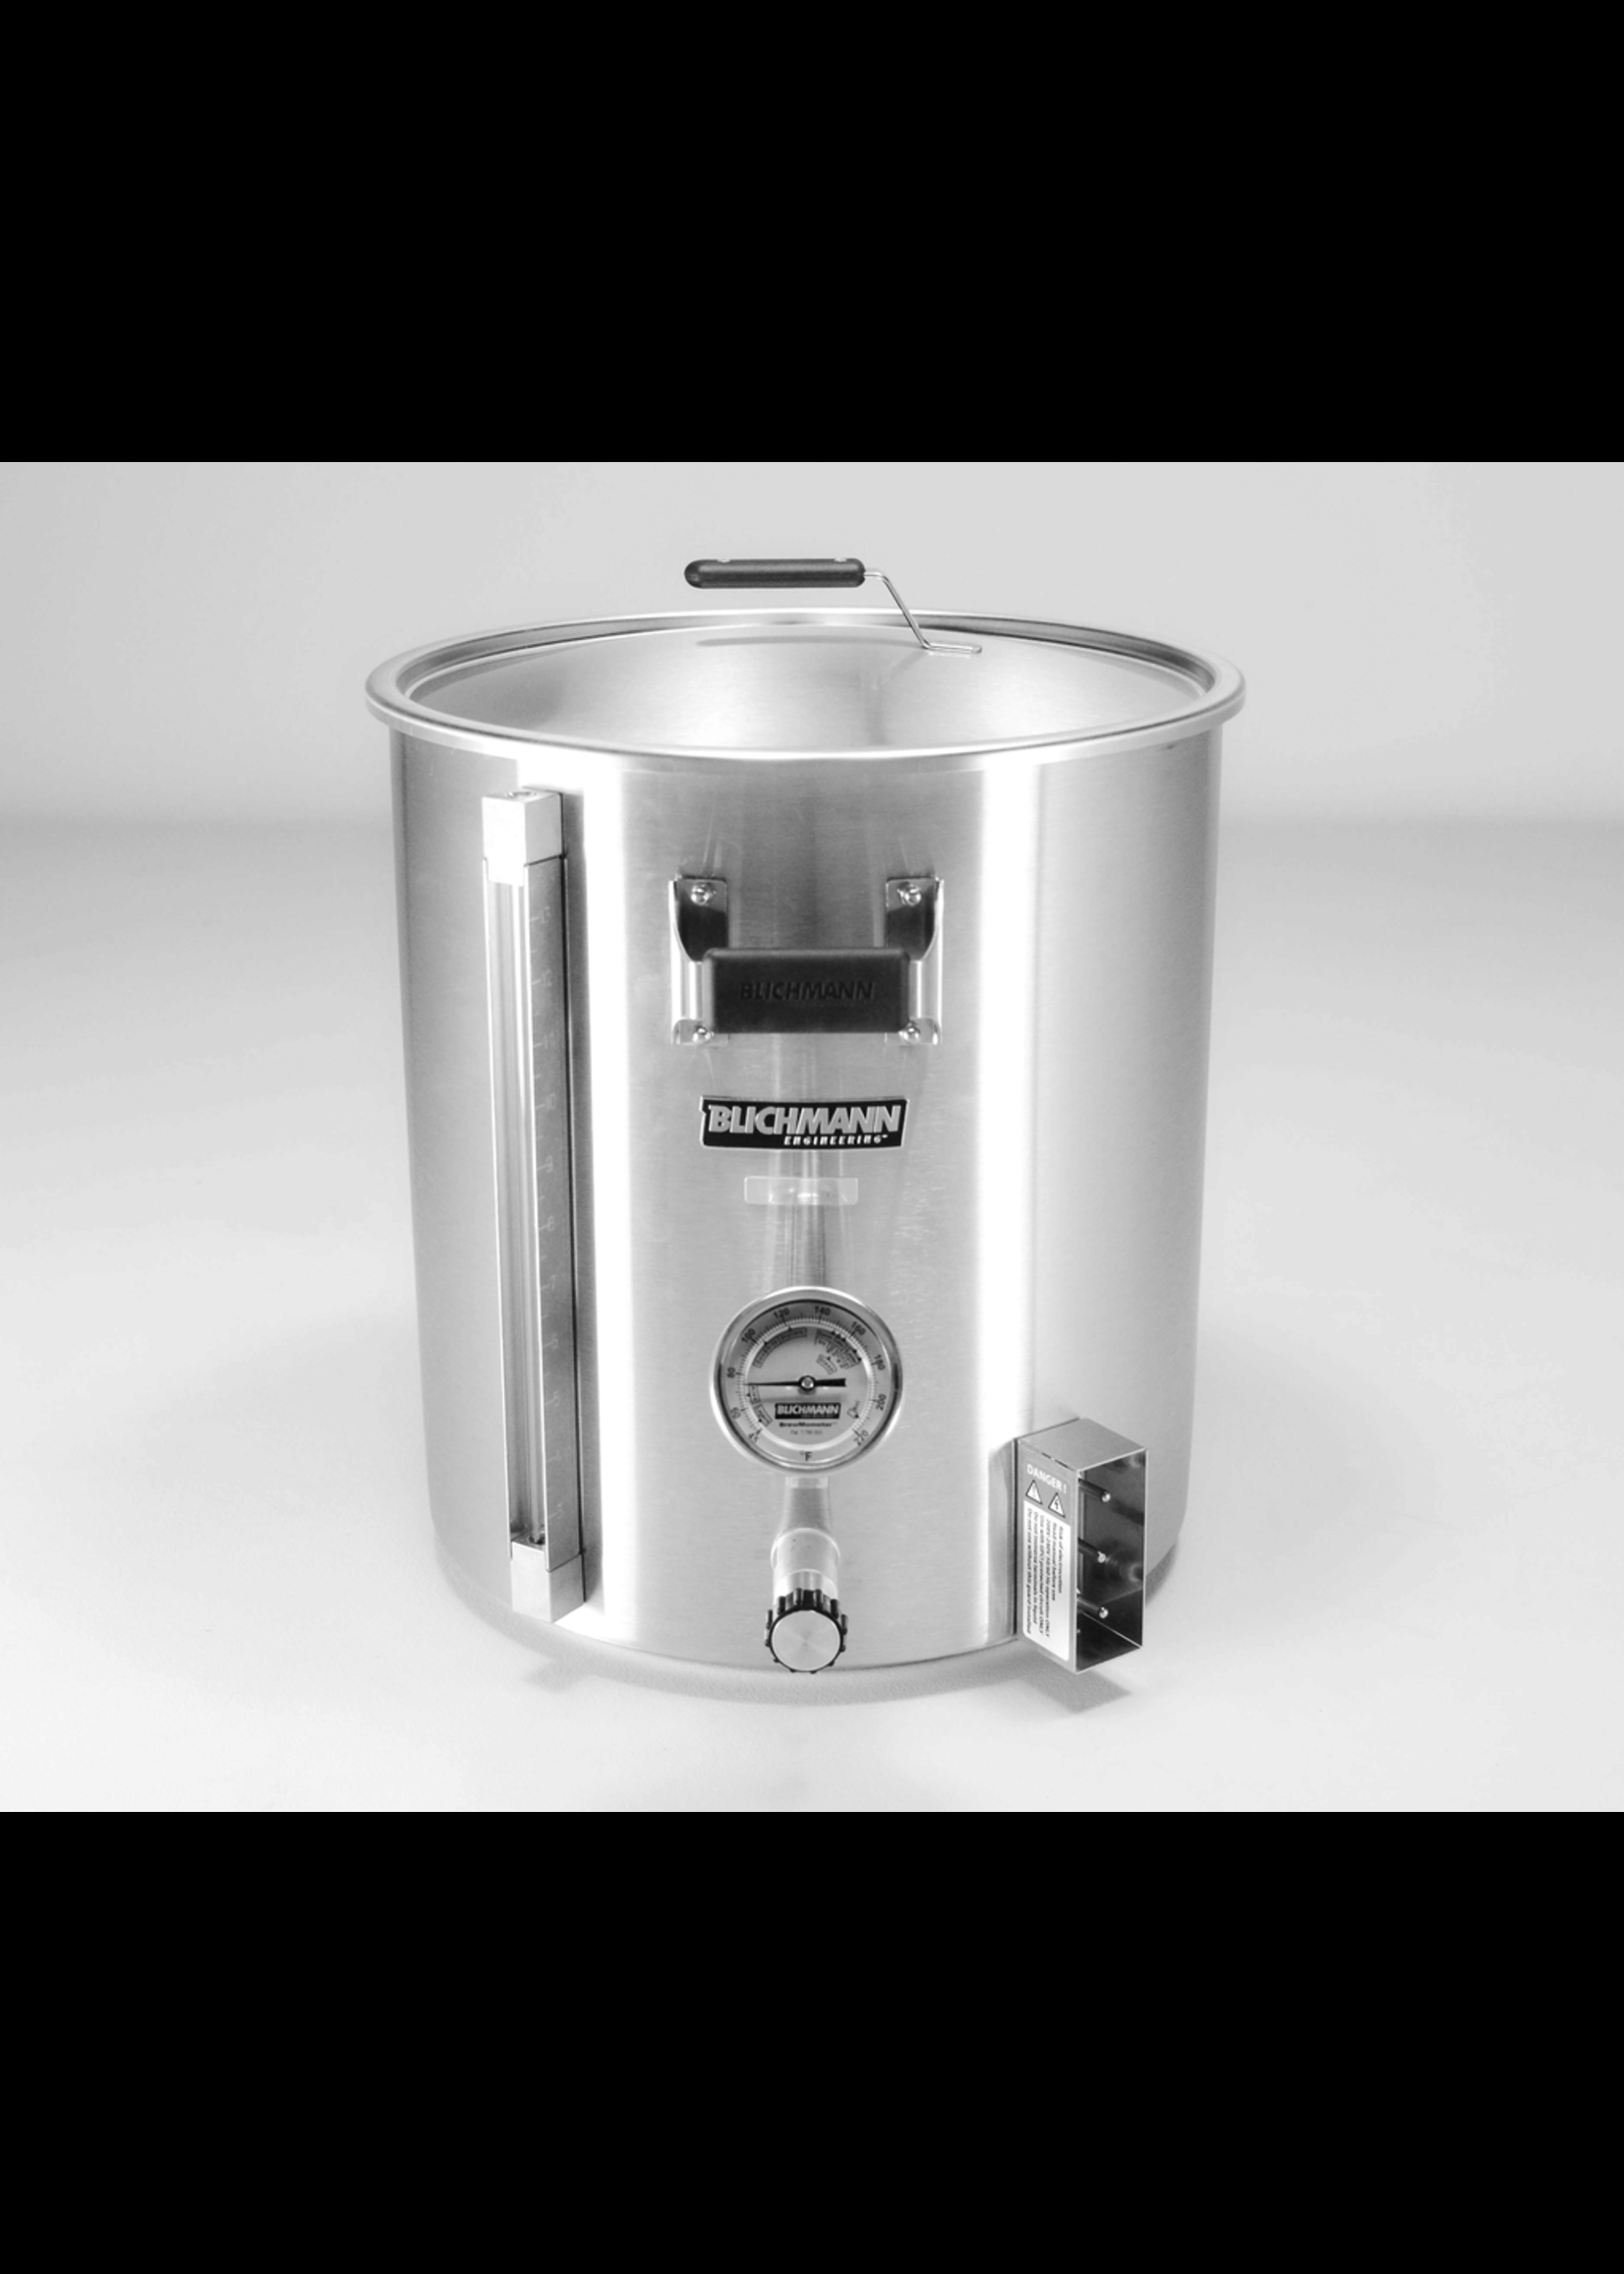 Blichmann Blichmann BoilerMaker G2 - 55 Gallon 240V Electric Brew Kettle (Celsius)